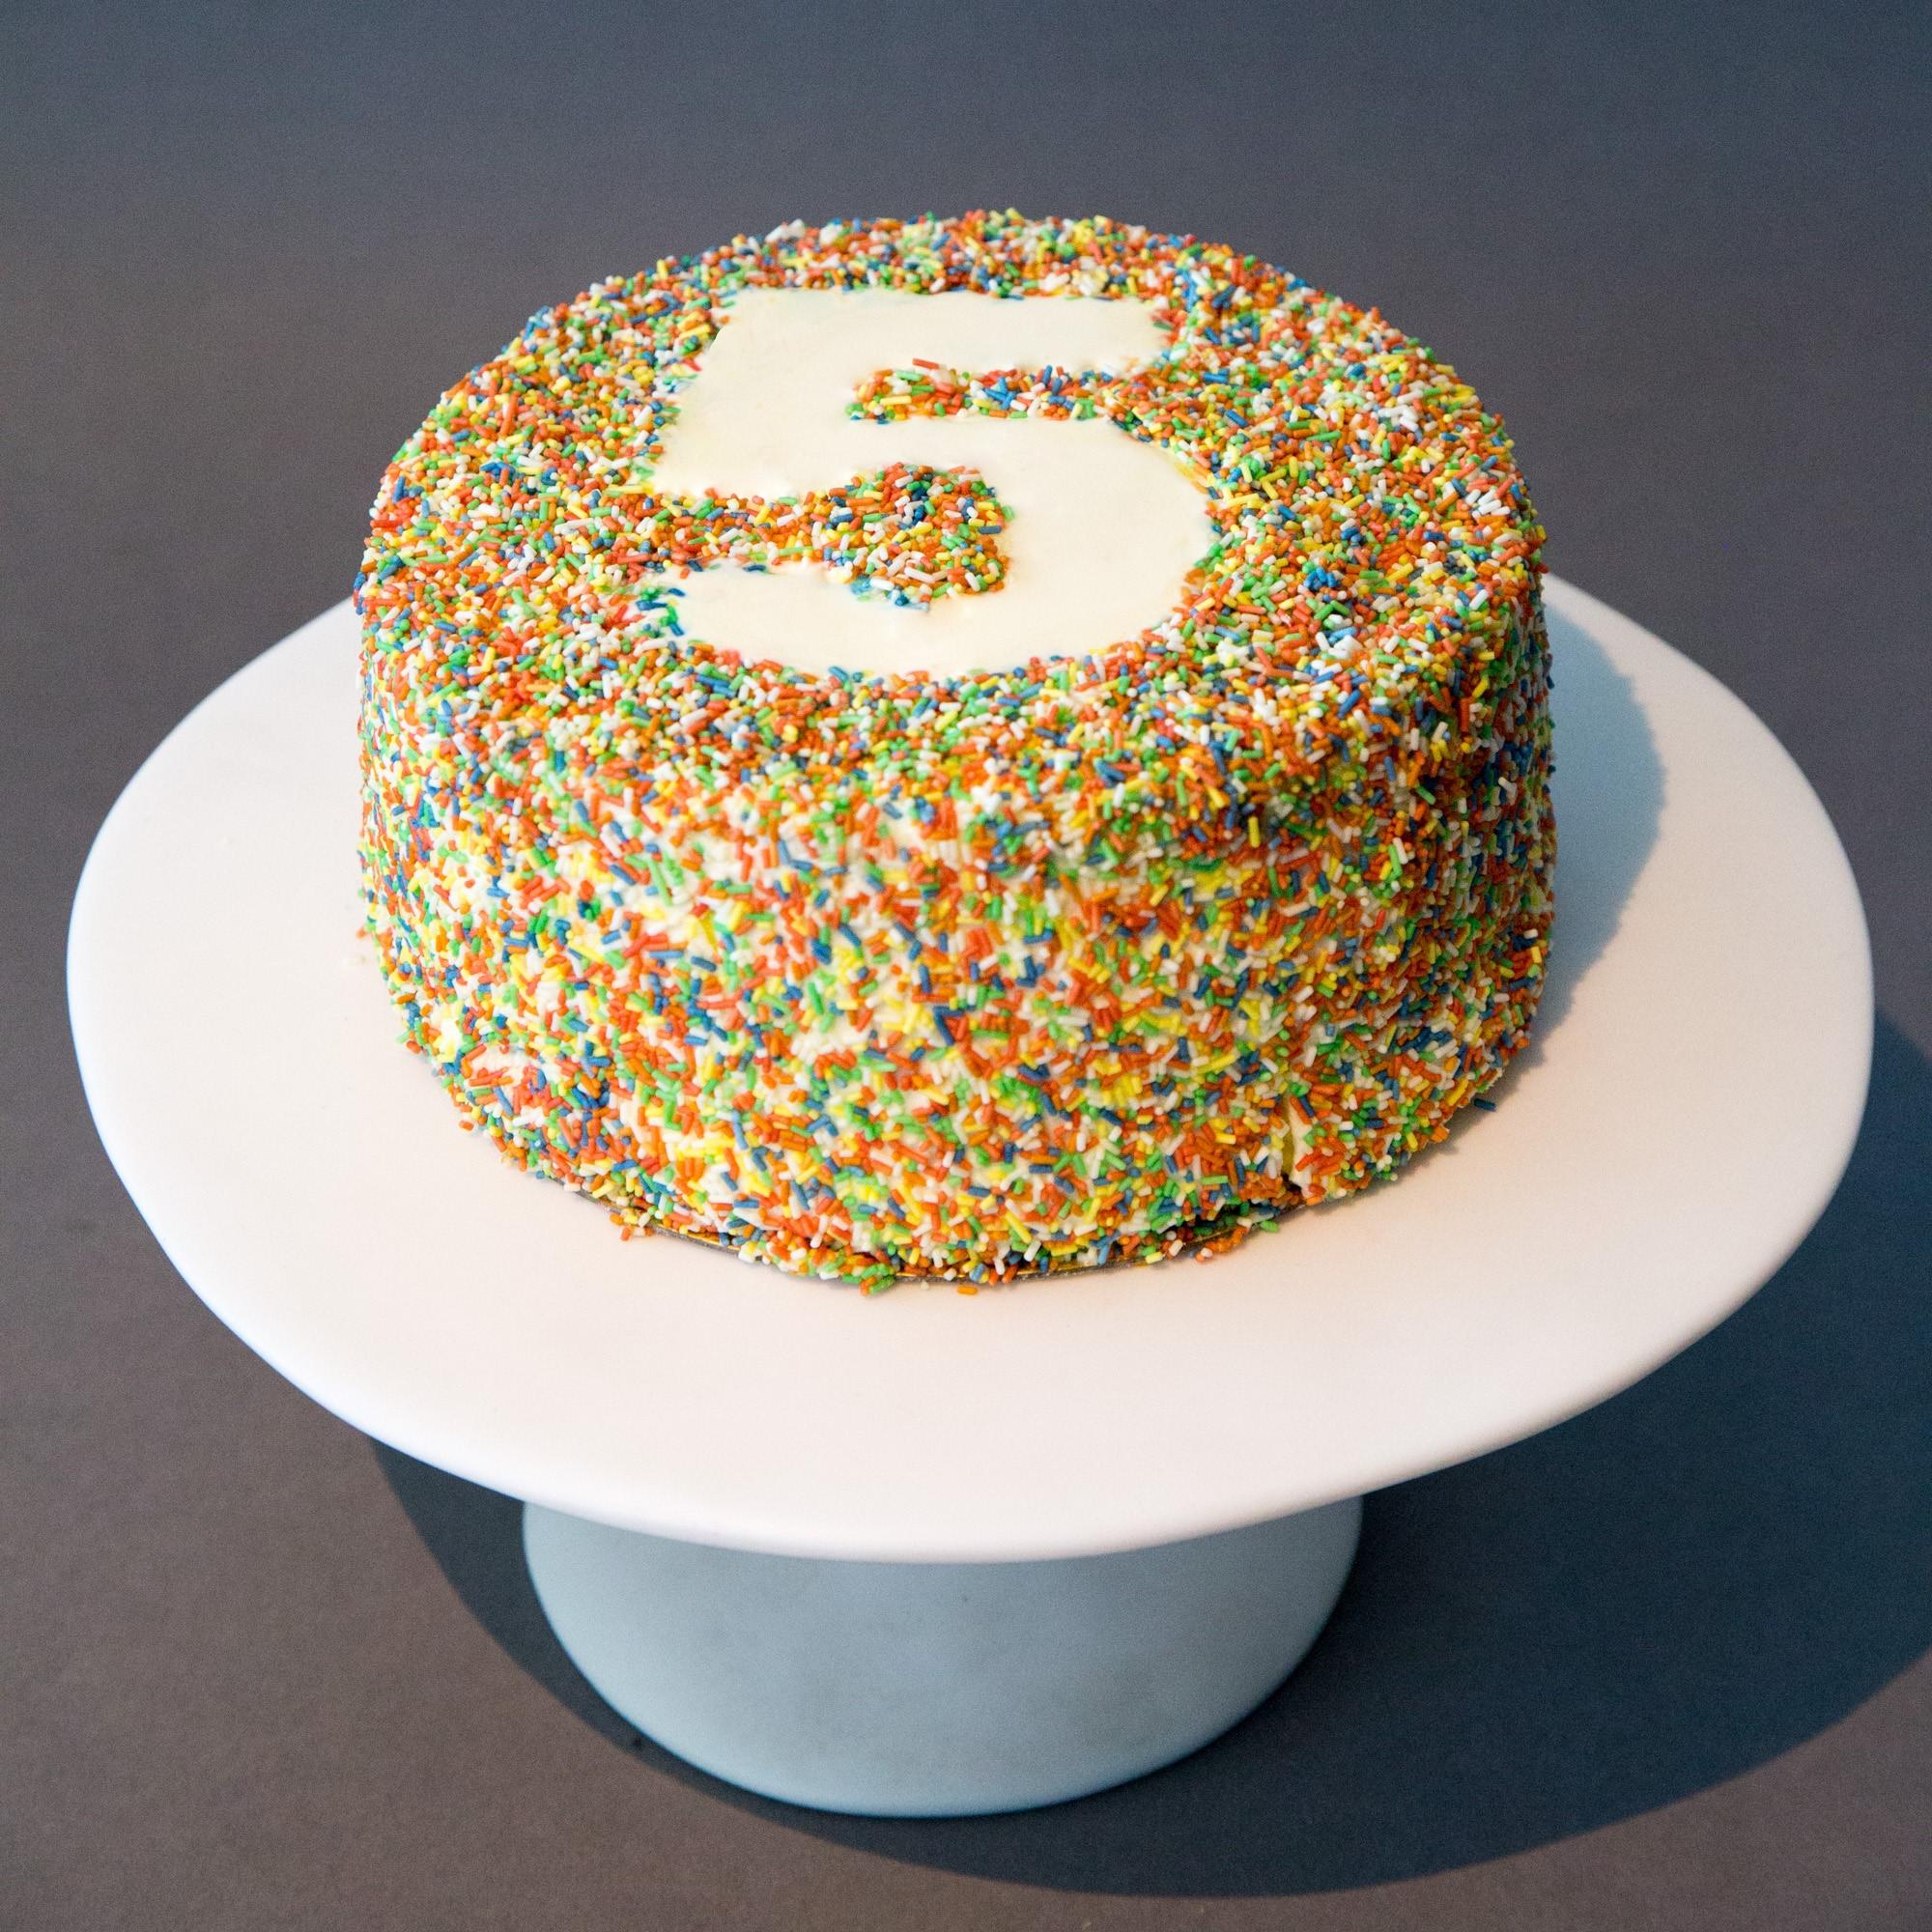 Sprinkle Birthday Cake.jpg